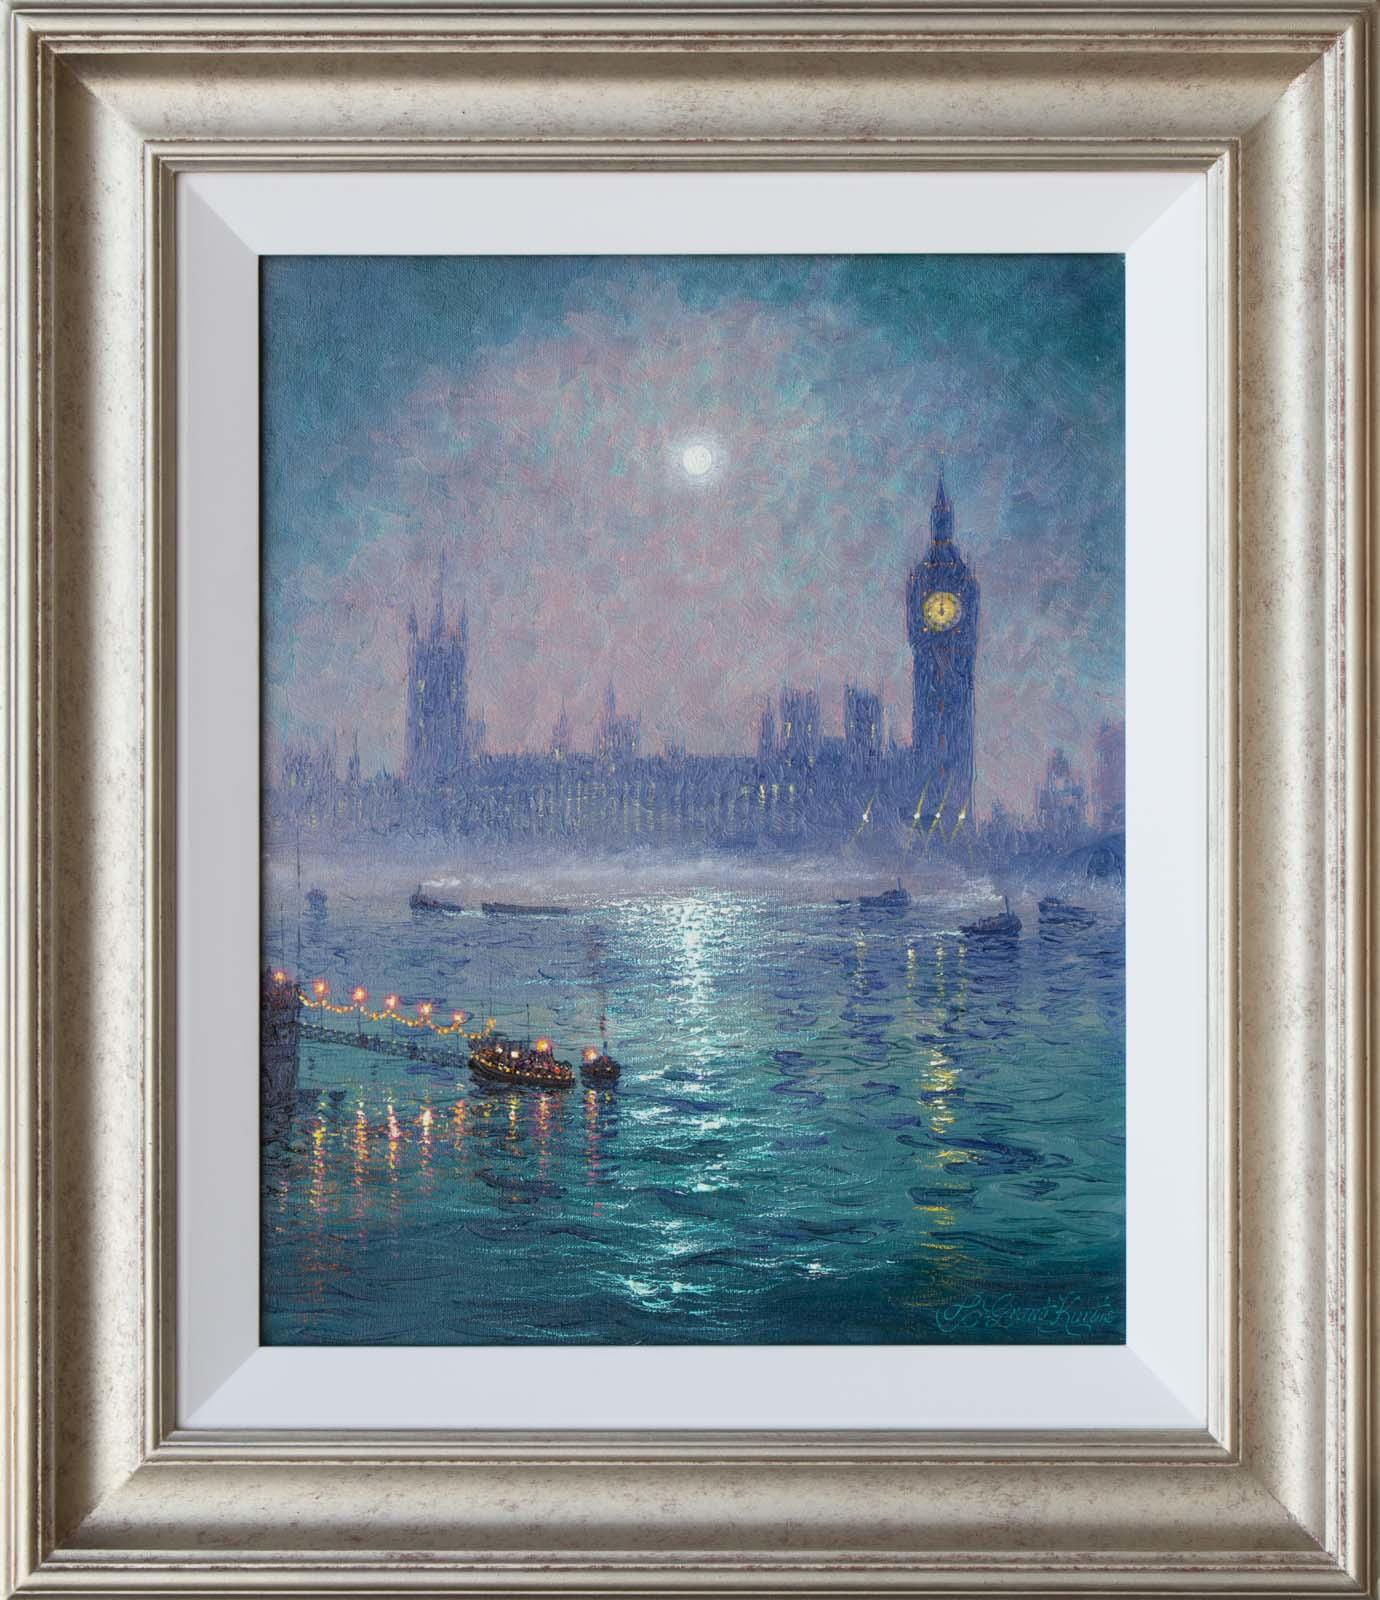 Westminster Chimes, Andrew Grant Kurtis